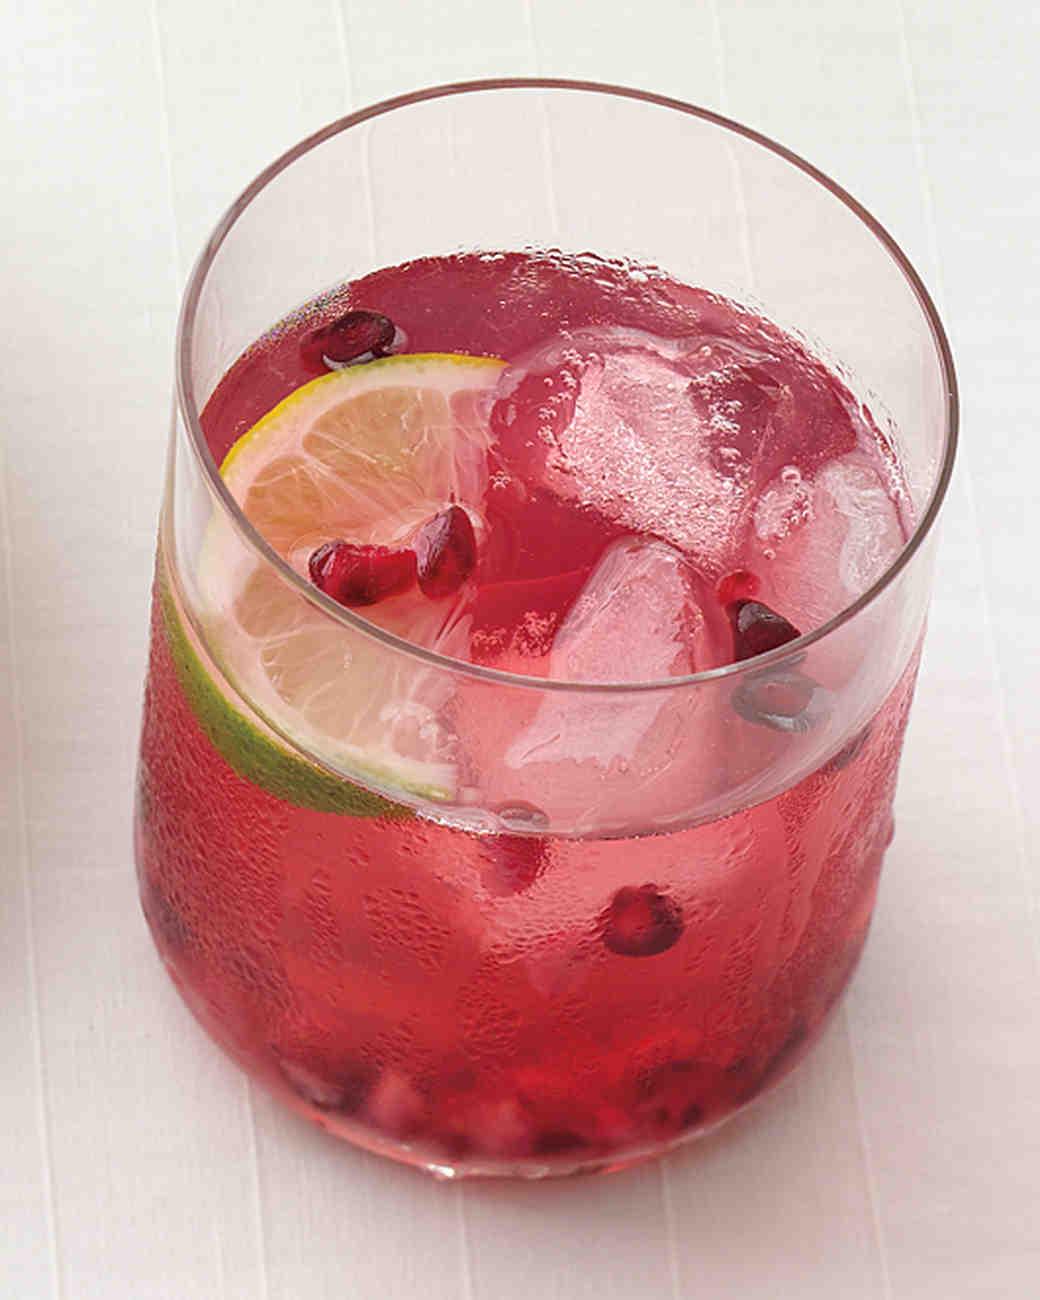 pomegrante-drink-0811mwd107509.jpg